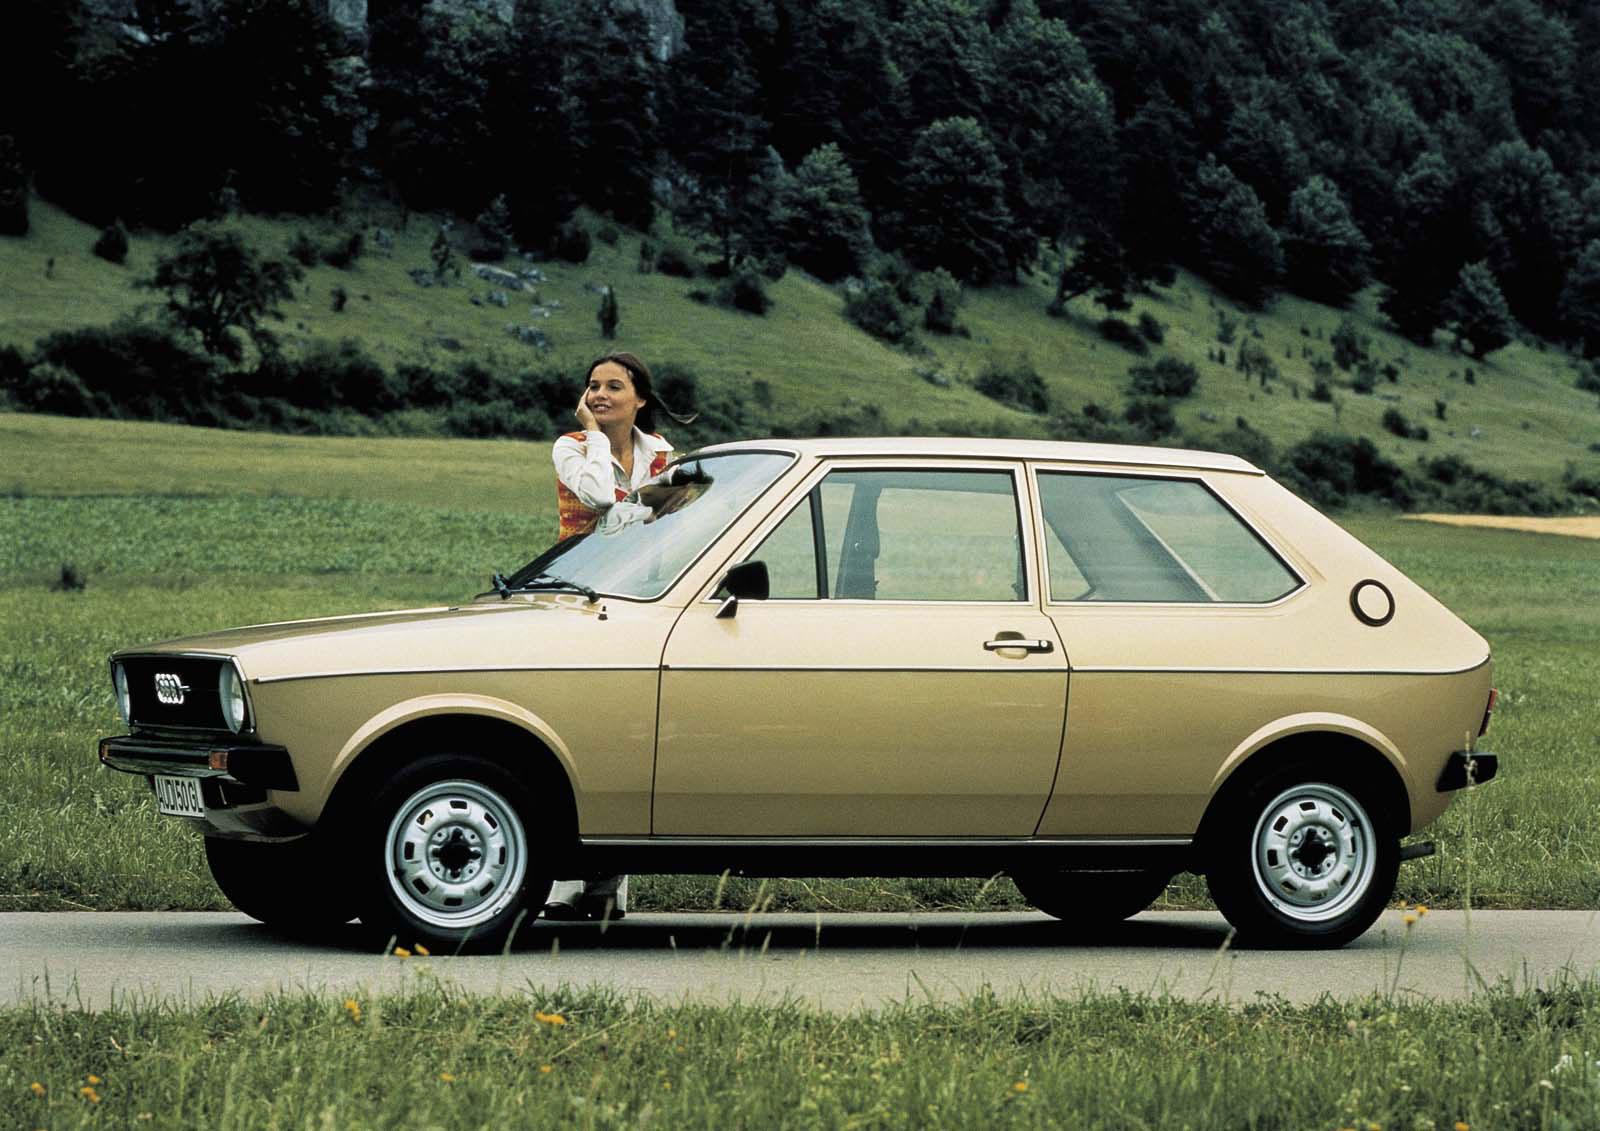 Audi 50 1973 motorgiga com Audi-50-LS-1975